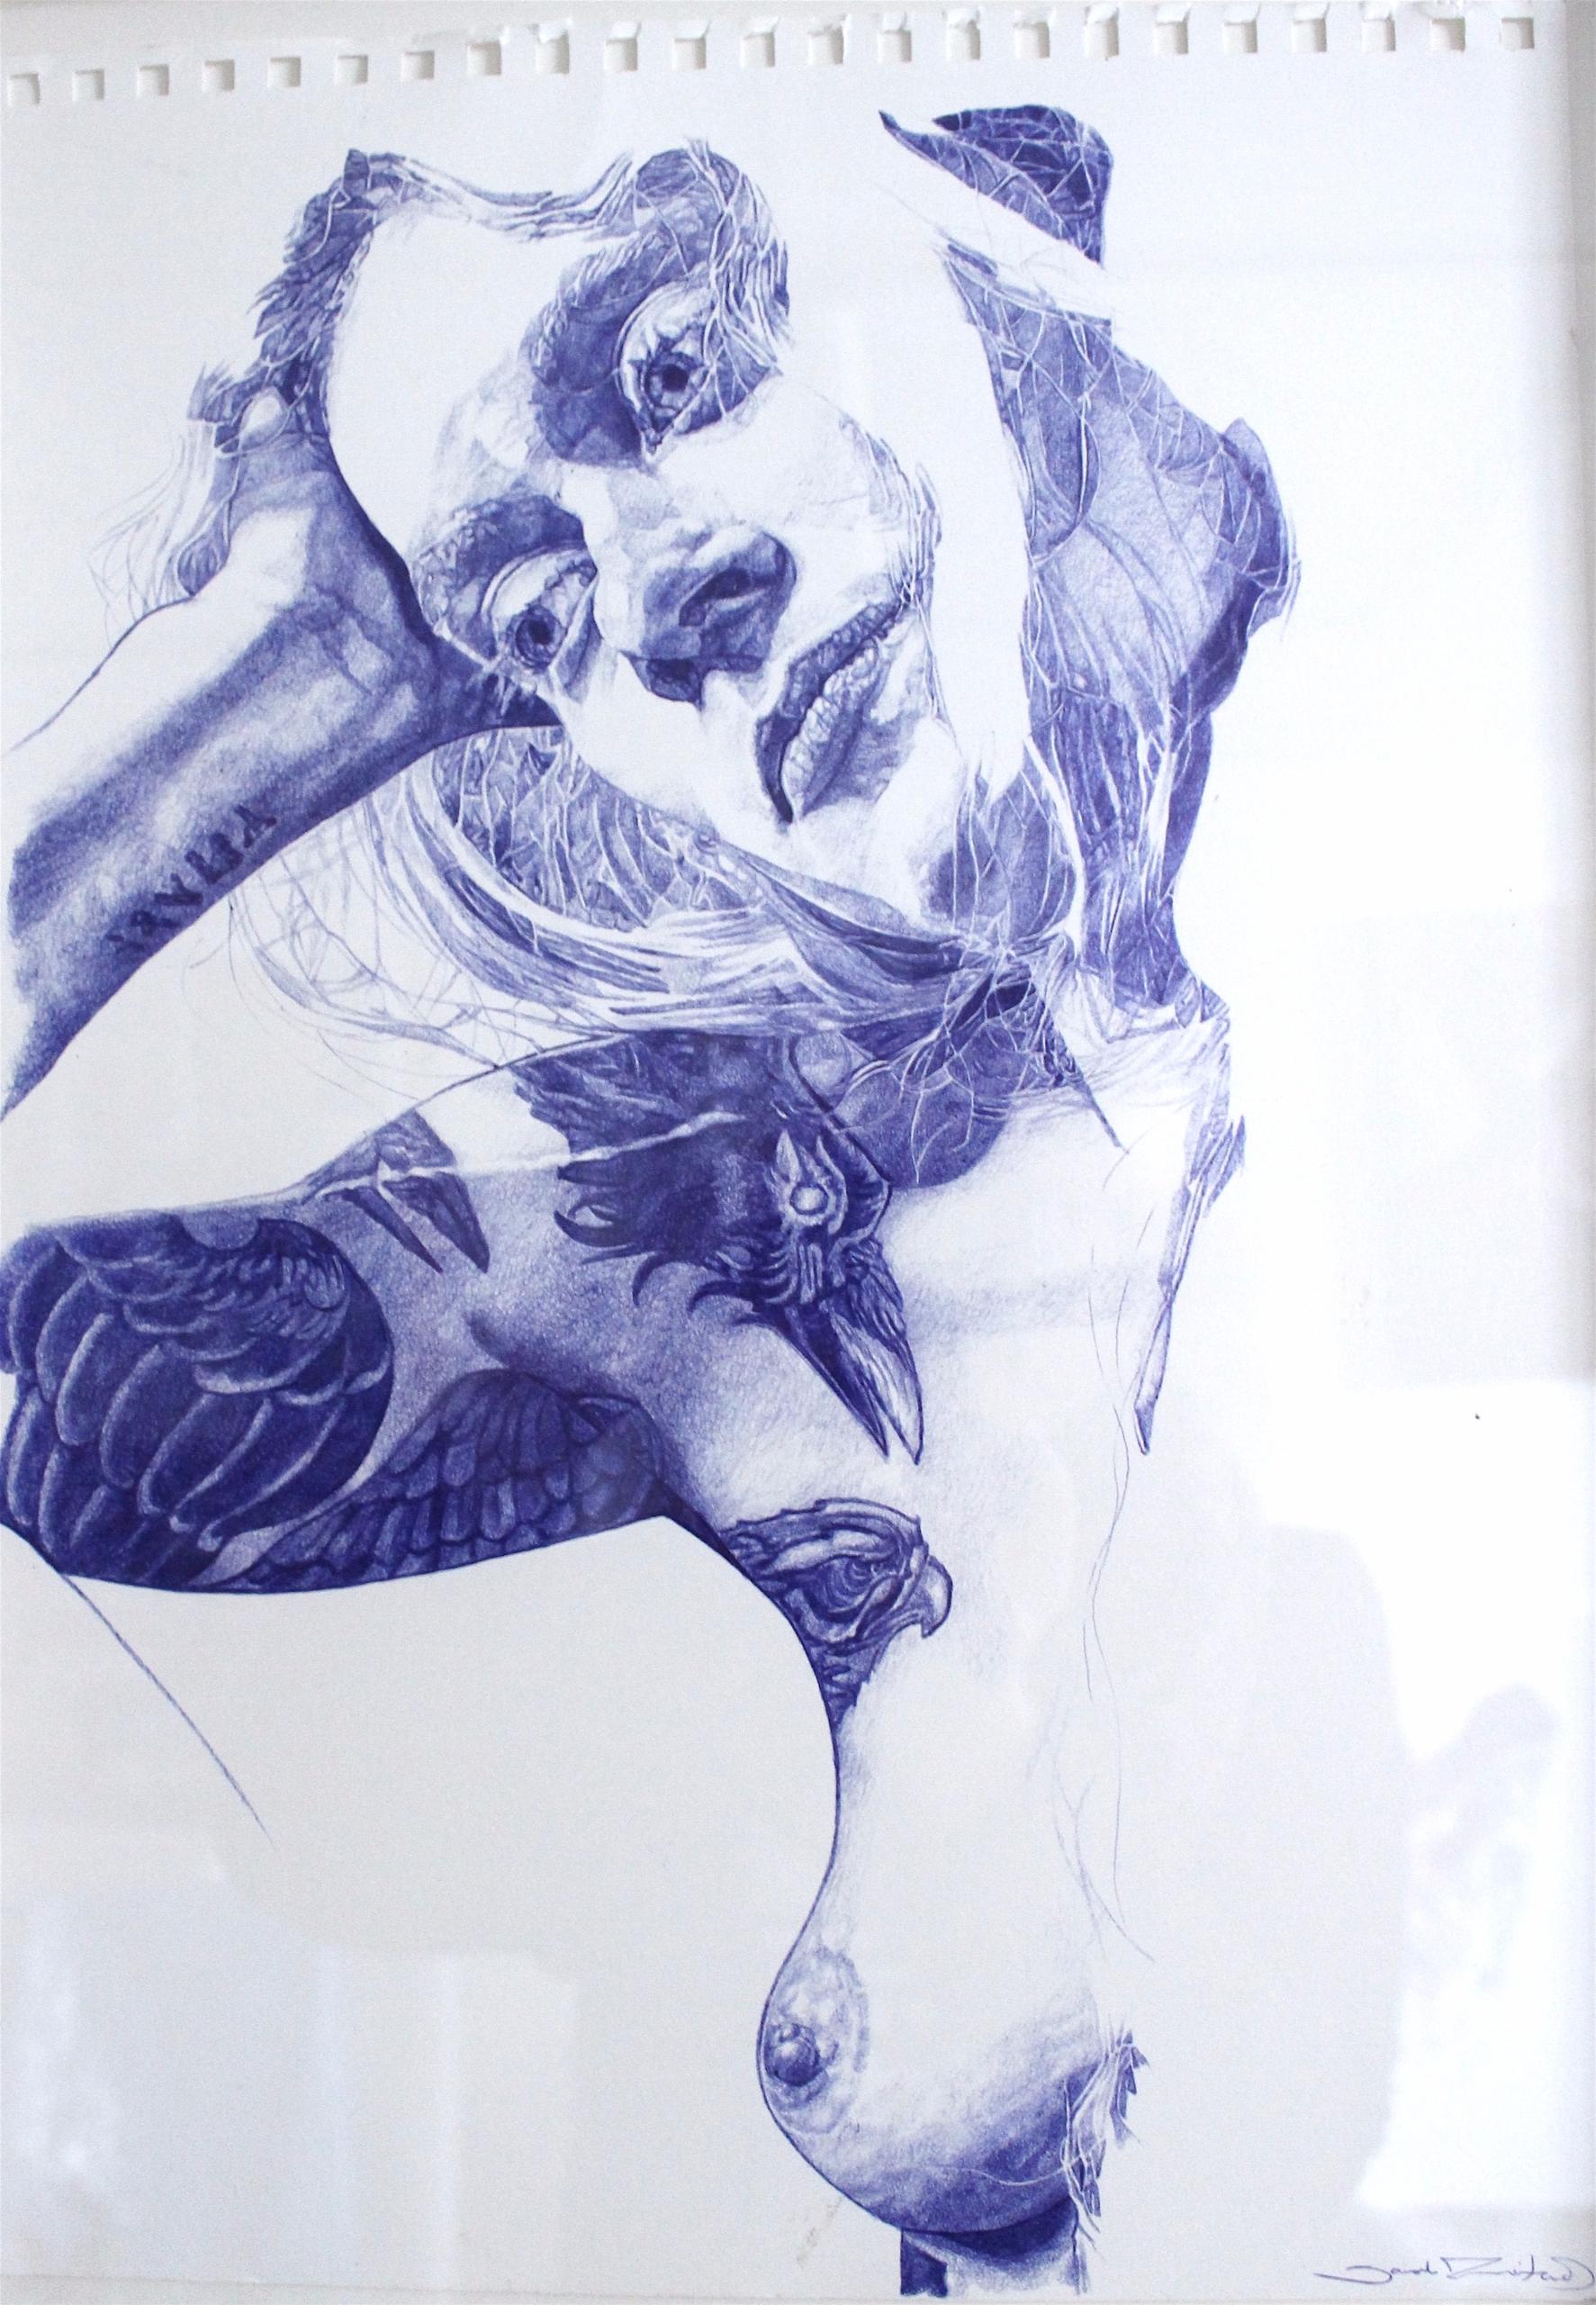 'Untitled 5' bic biro paper, 30 - sarahmuirhead | ello